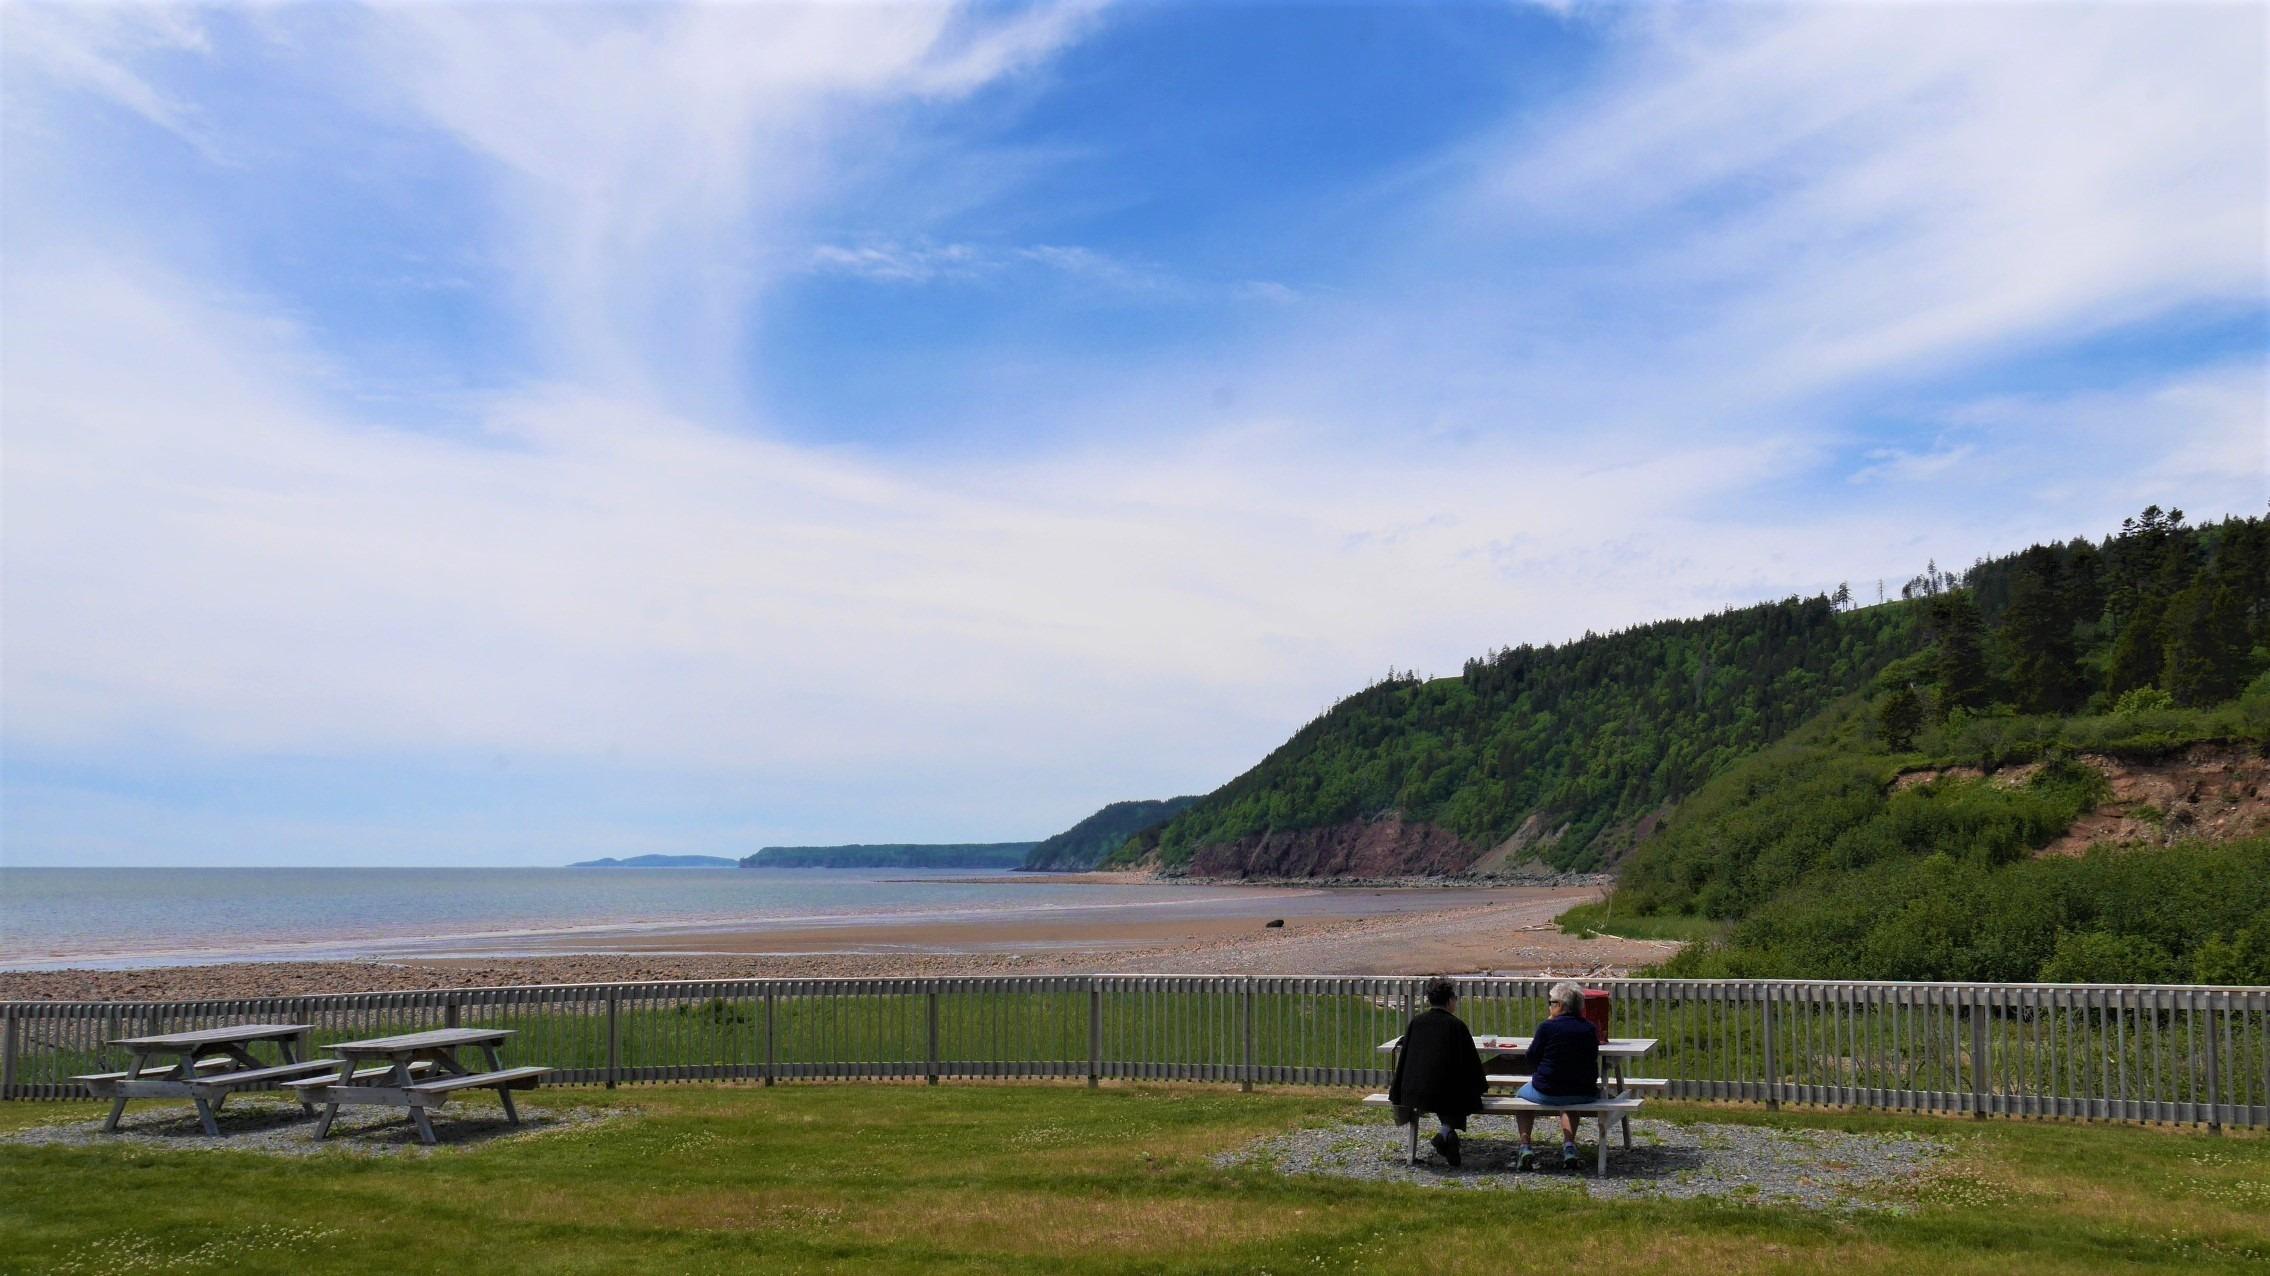 Fundy Trail Parkway Plage Long blog voyage Nouveau-Brunswick Canada Arpenter le chemin